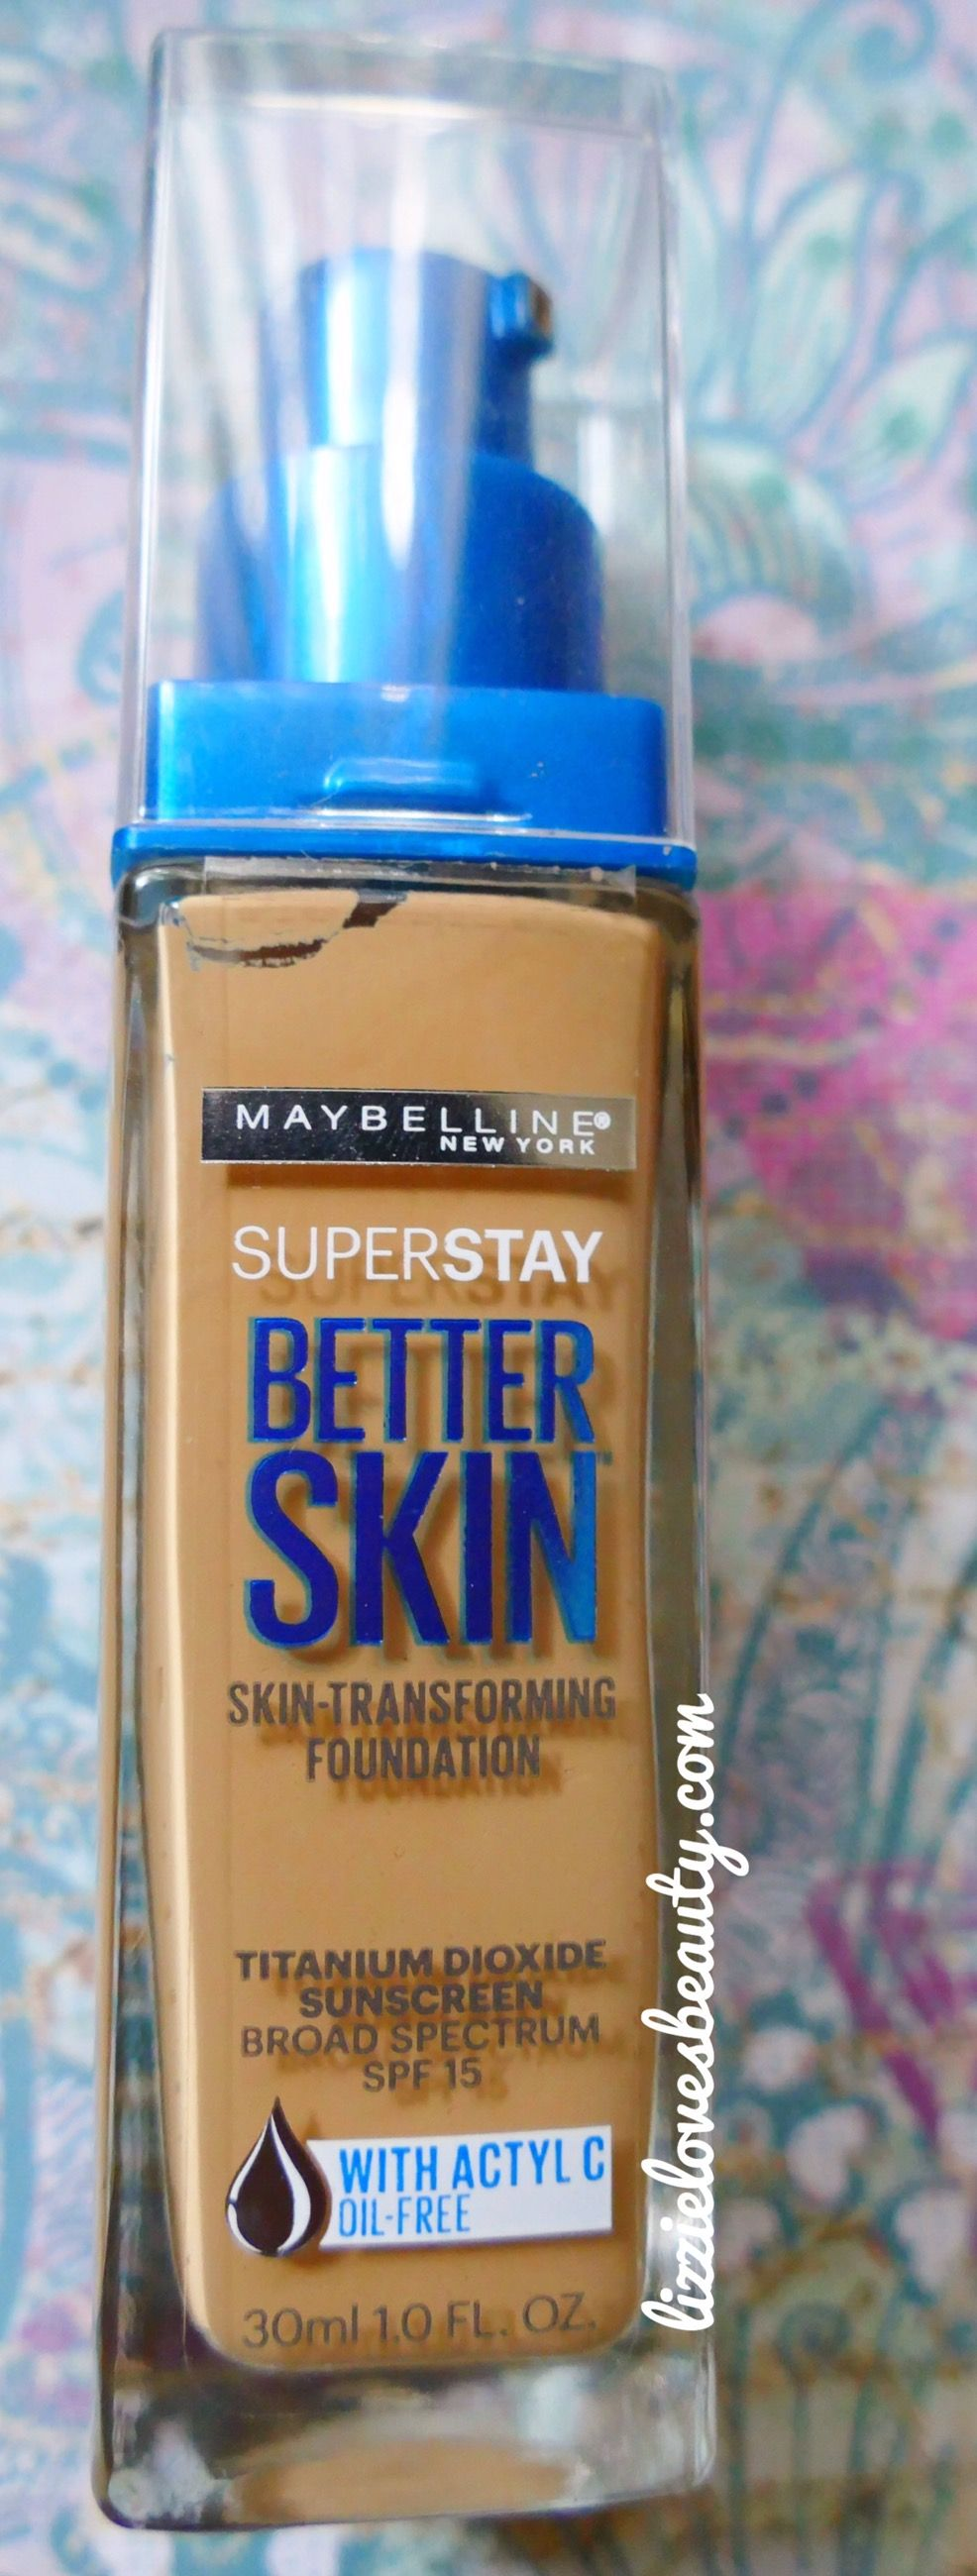 Maybelline SuperStay Better Skin Foundation and Concealer